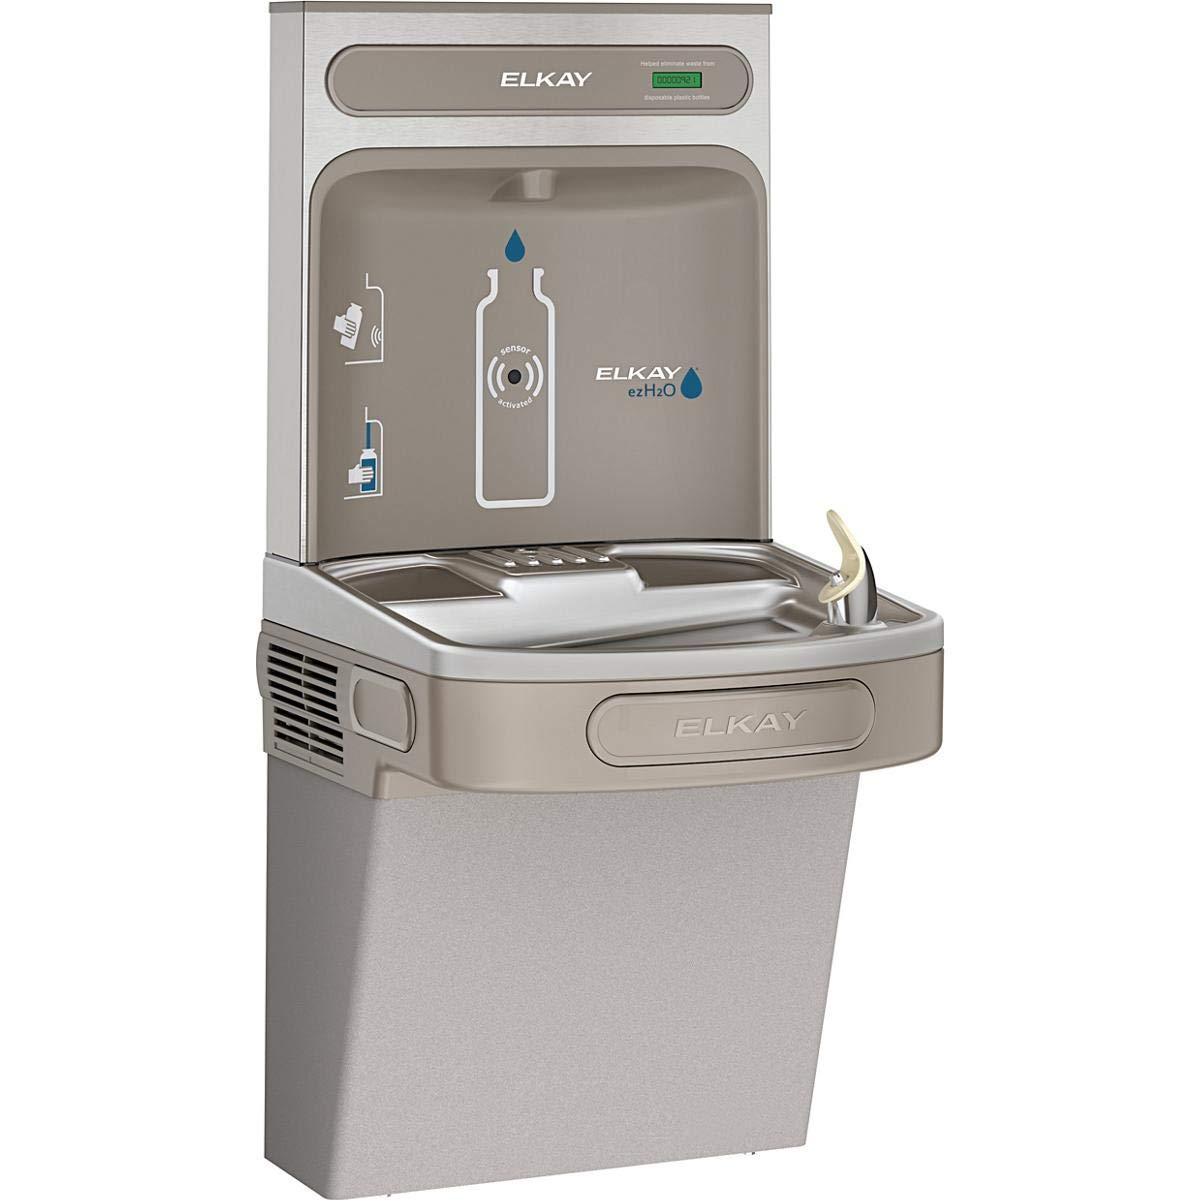 Elkay EZS8WSLKEZH2O Bottle Filling Station with Single ADA Cooler, Non-Filtered 8 GPH, Light Gray